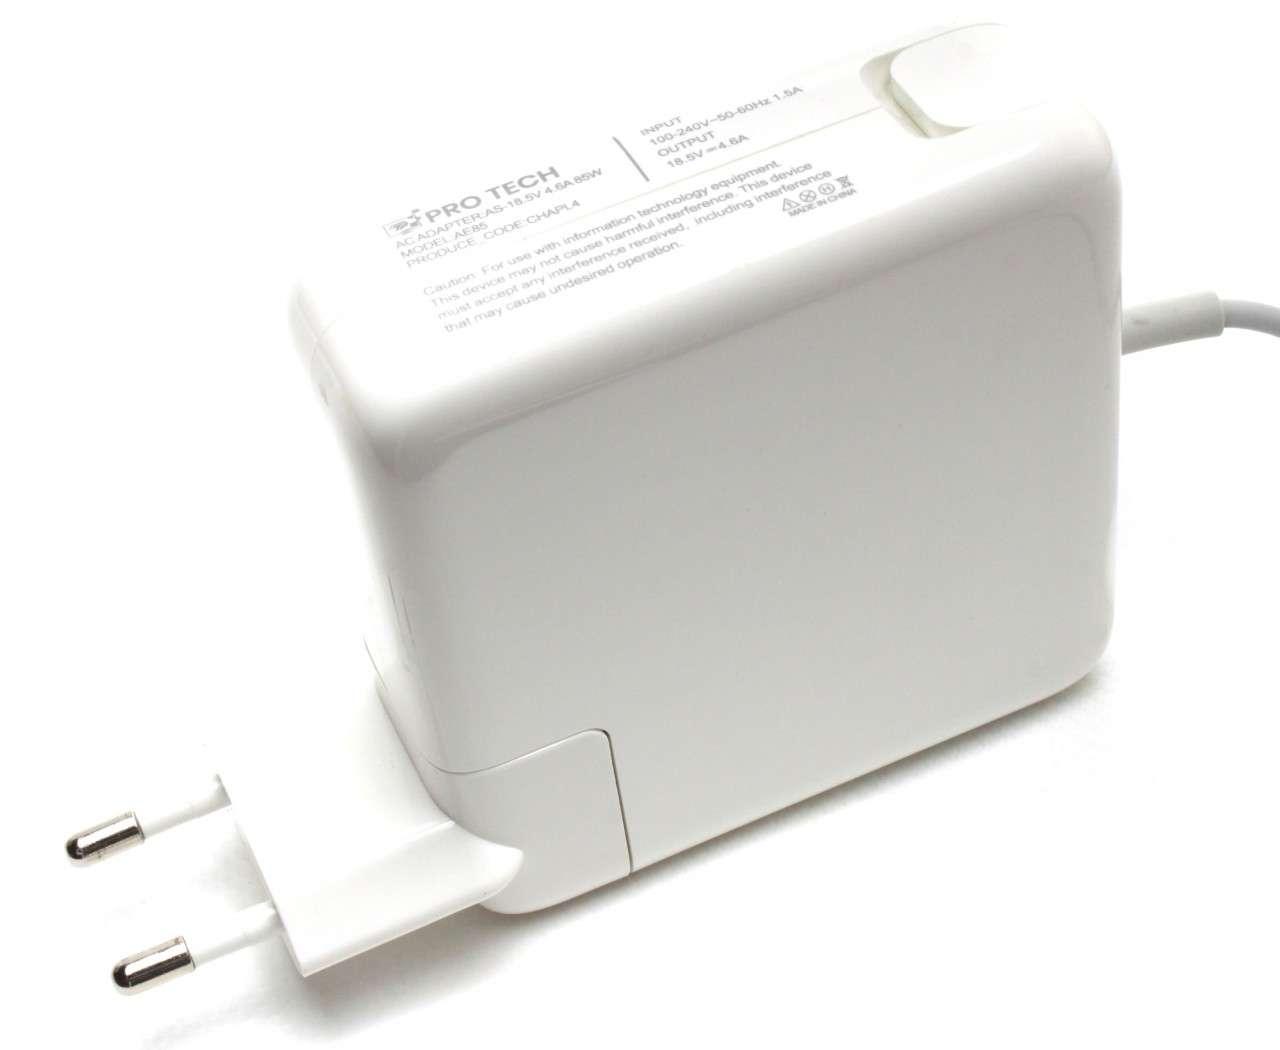 Incarcator Apple MacBook Pro 17 inch 2.4GHz 85W Replacement imagine powerlaptop.ro 2021